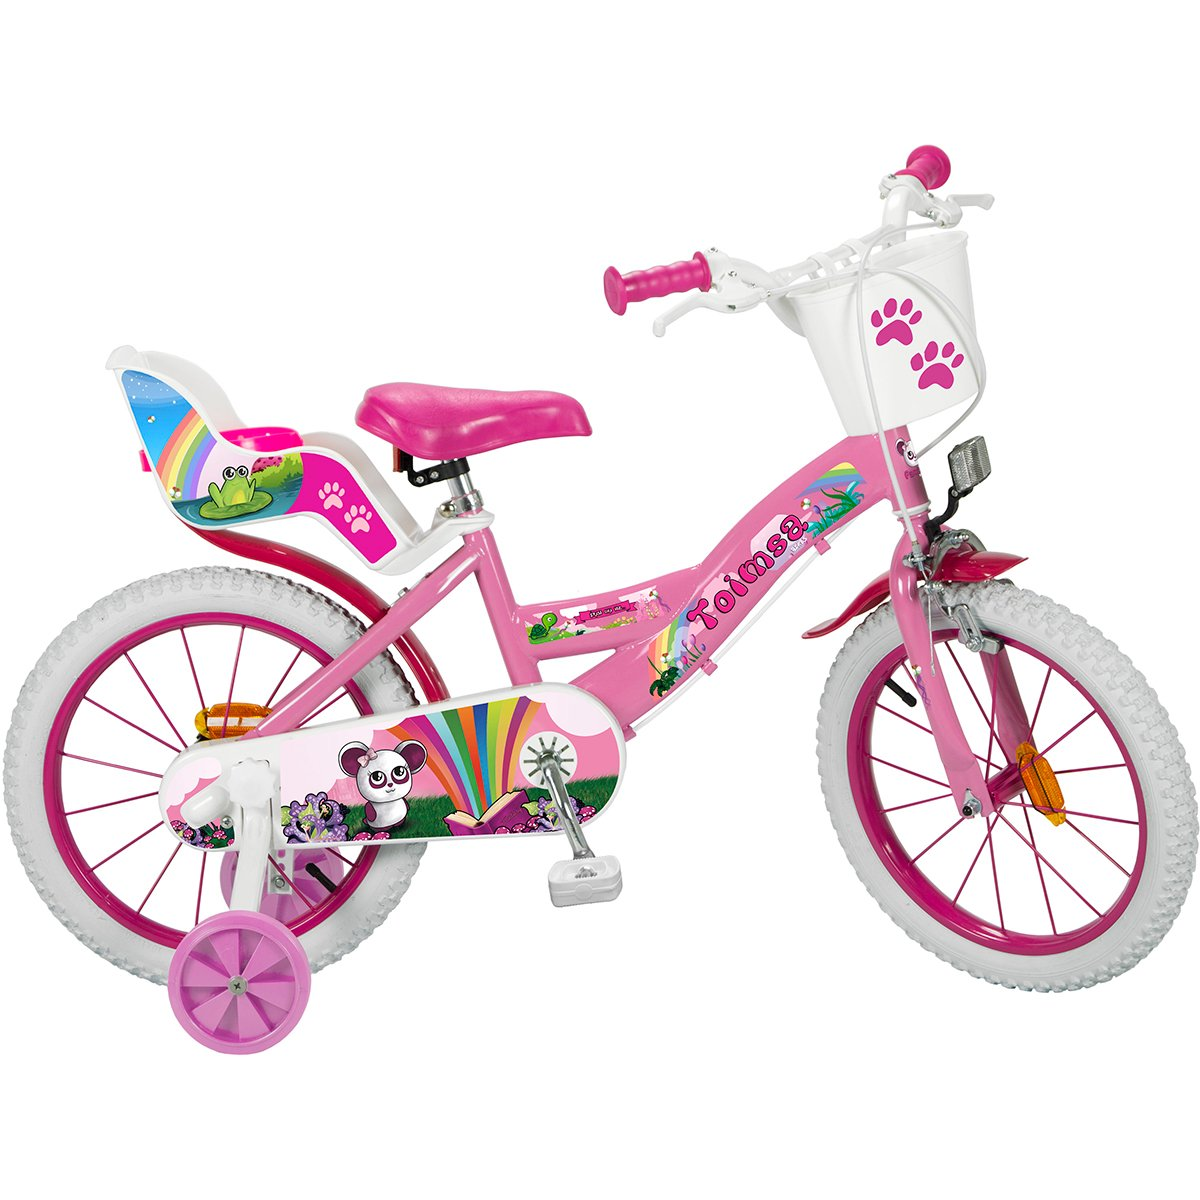 Bicicleta Toimsa, 16 inch, Fantasy